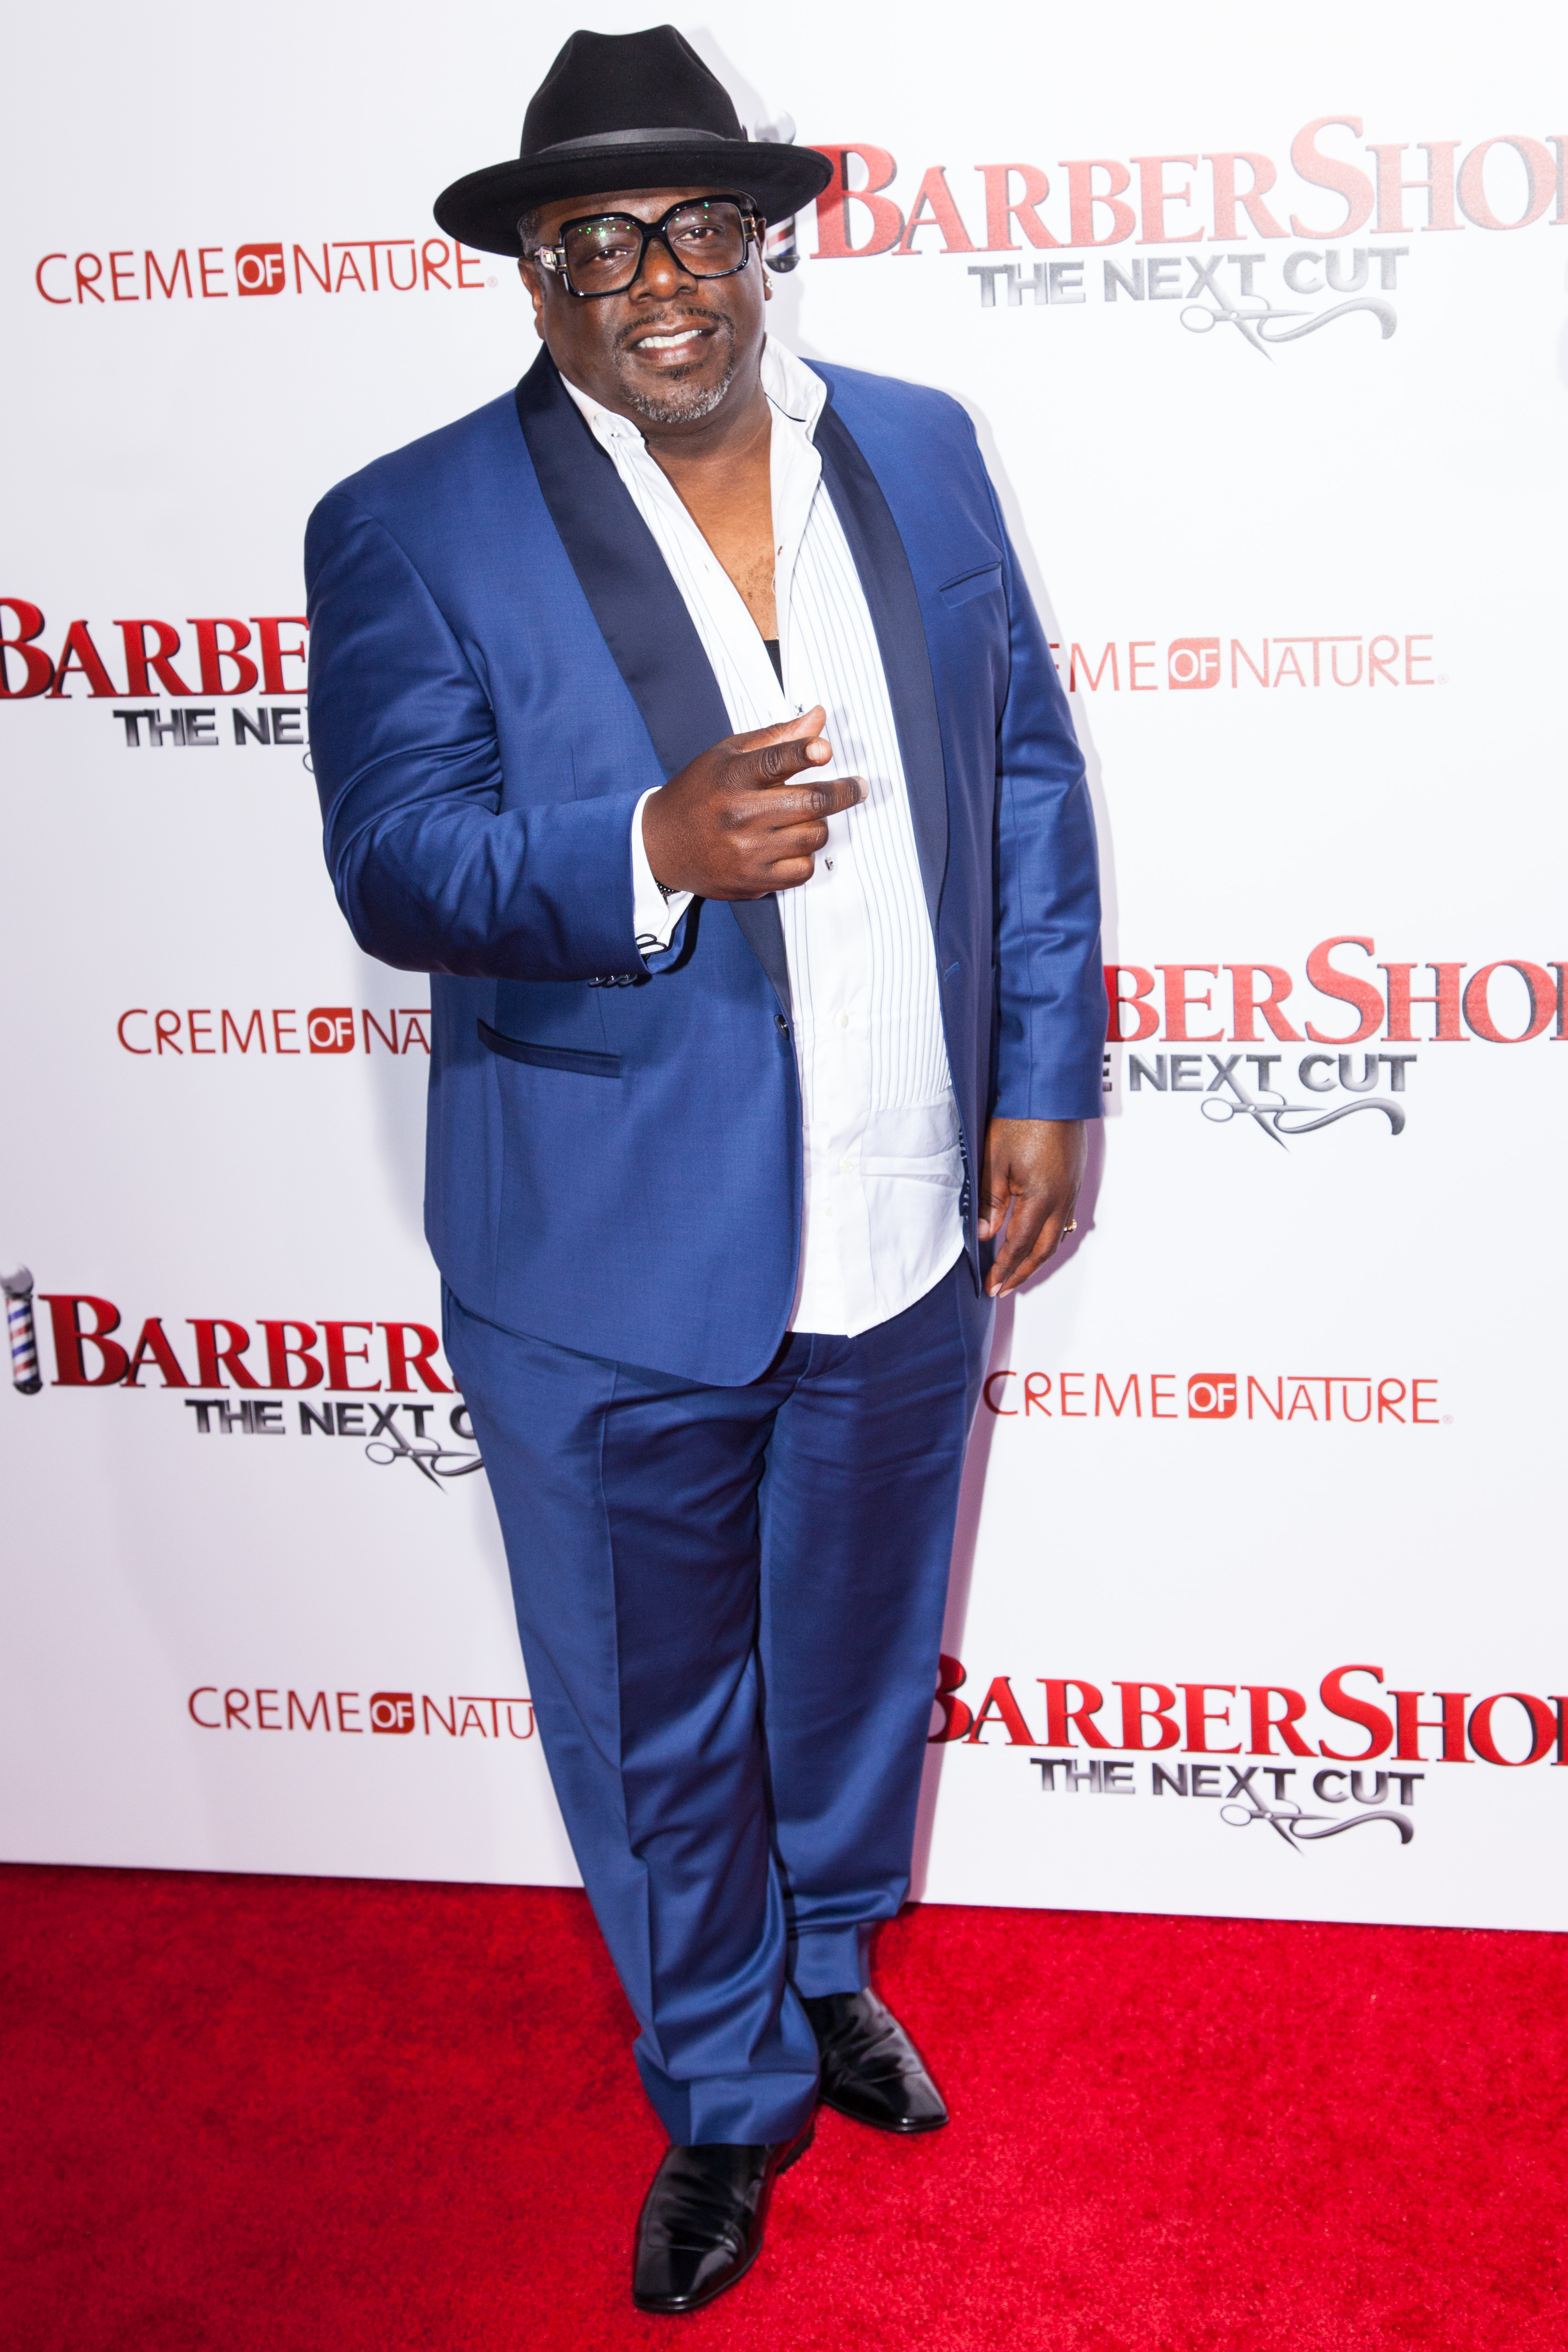 Barbershop 2 The Next Cut Los Angeles Premiere, Los Angeles, USA - 06 Apr 2016